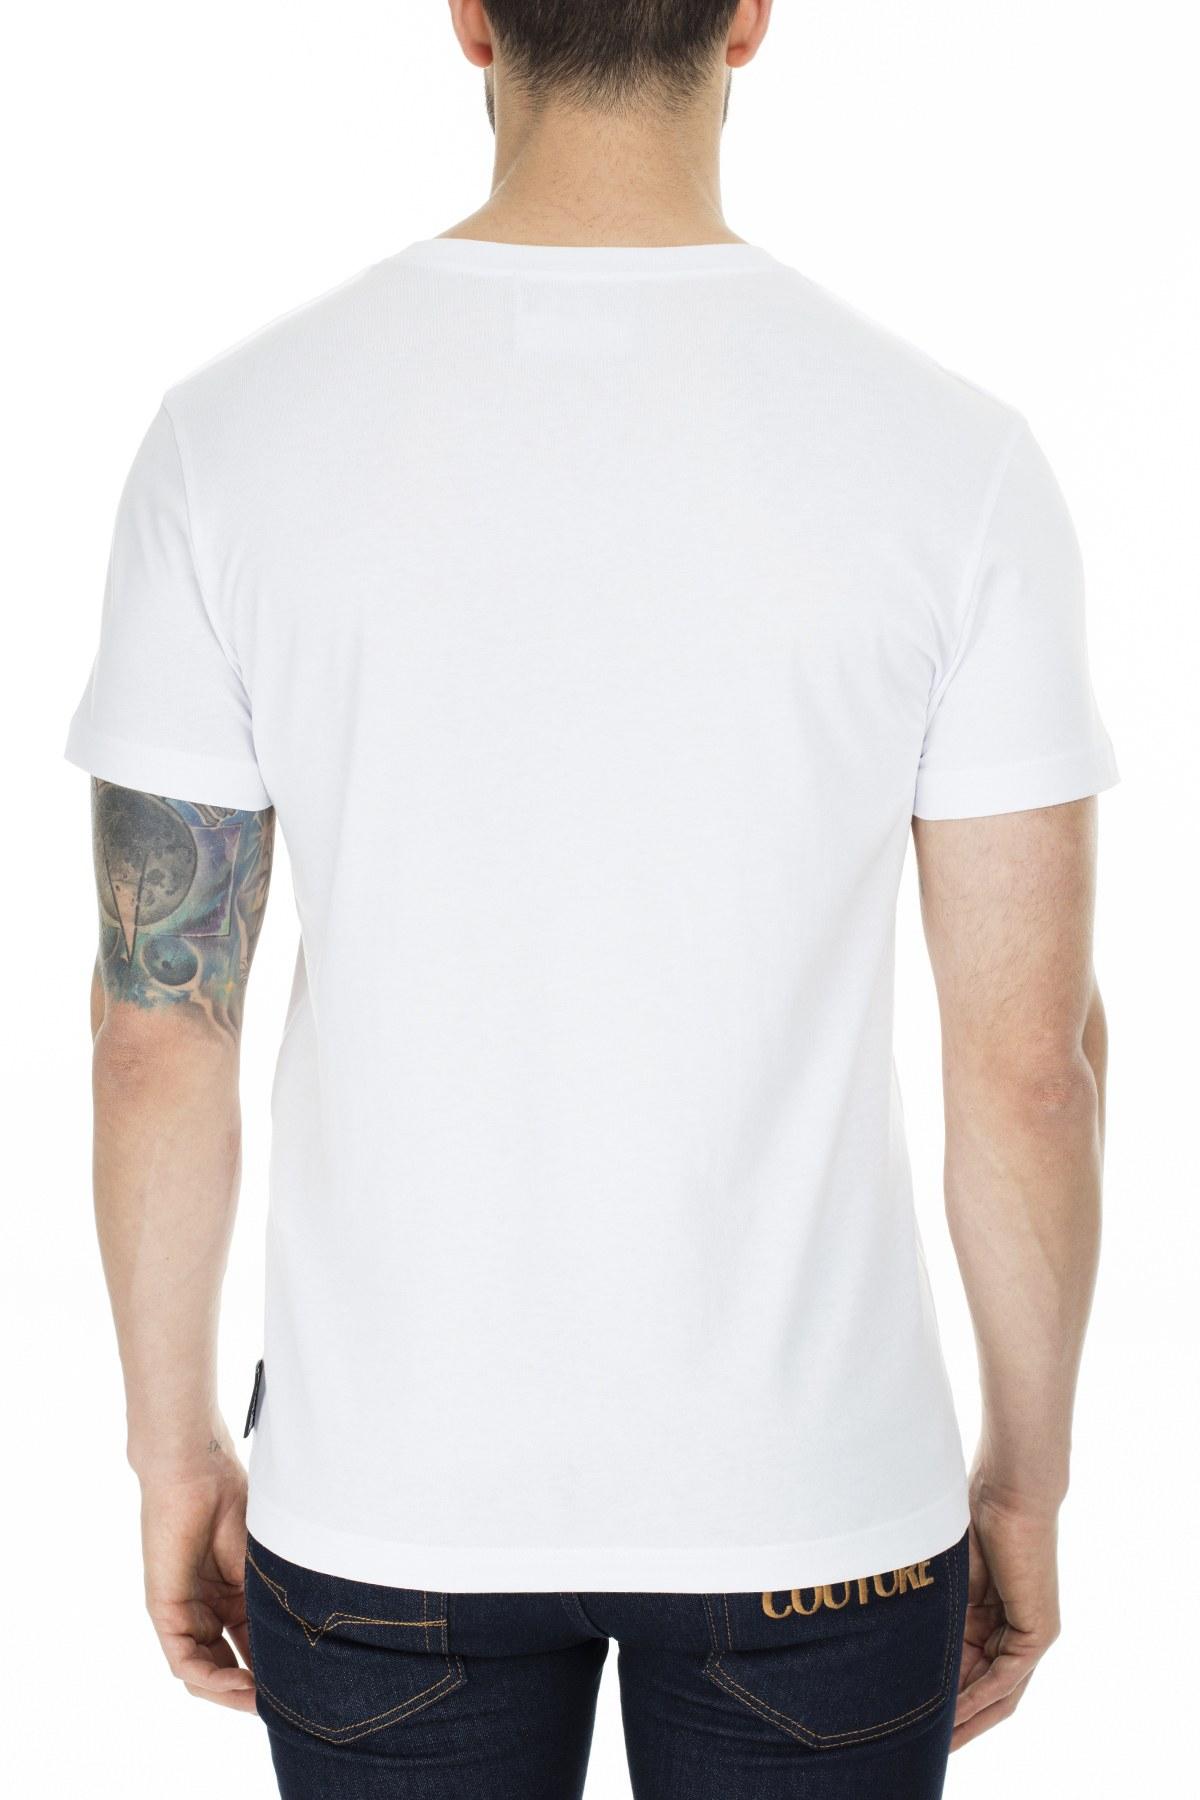 Versace Jeans Couture Slim Fit T Shırt Erkek T Shirt B3GVB7TS 30319003 BEYAZ